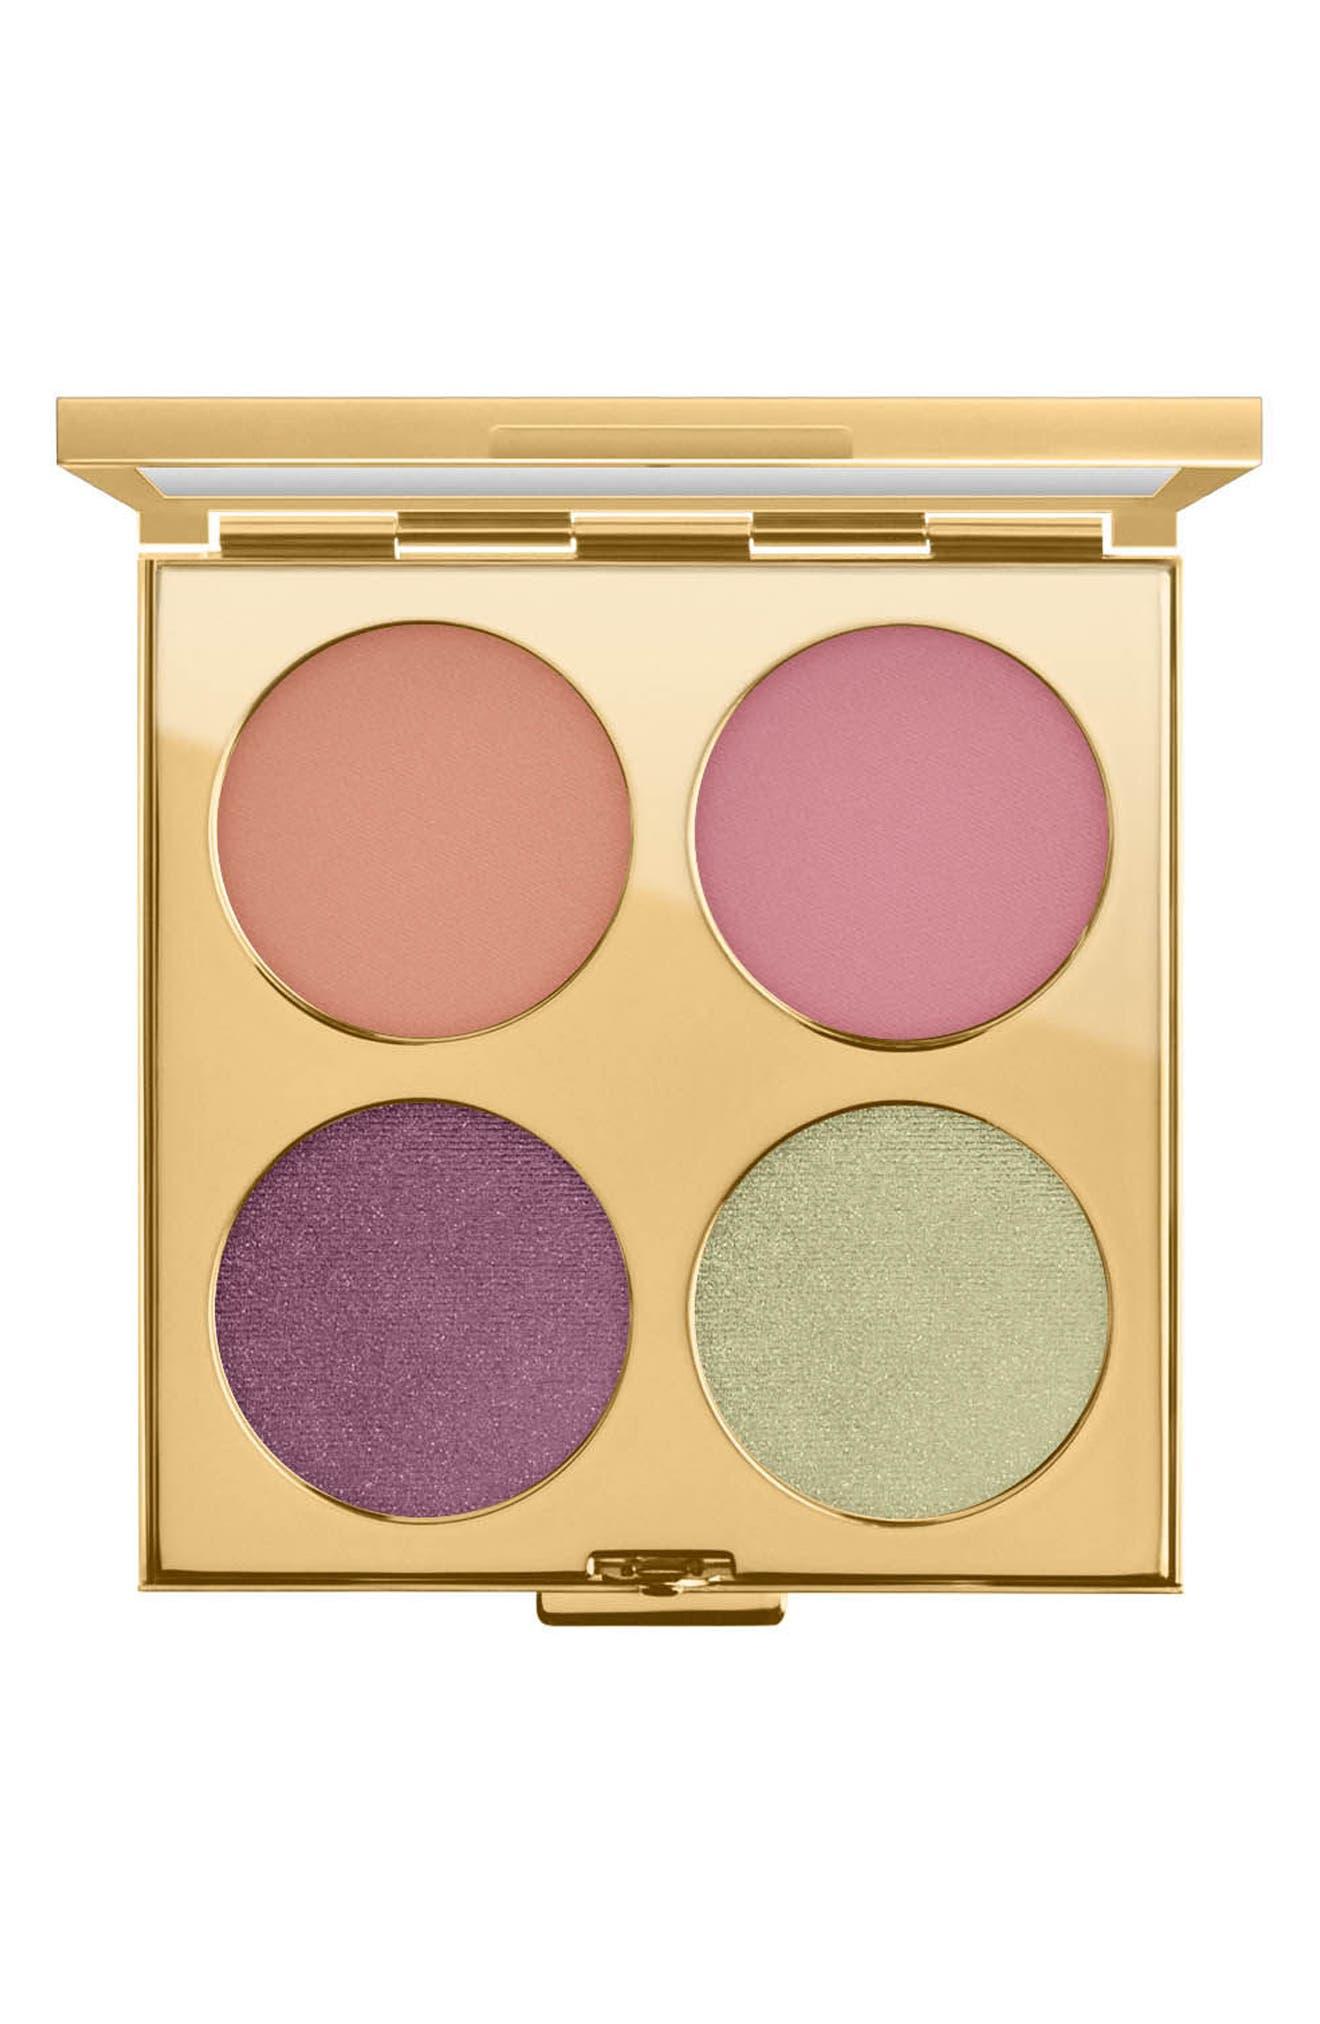 MAC Padma Lakshmi Eyeshadow Palette (Limited Edition)